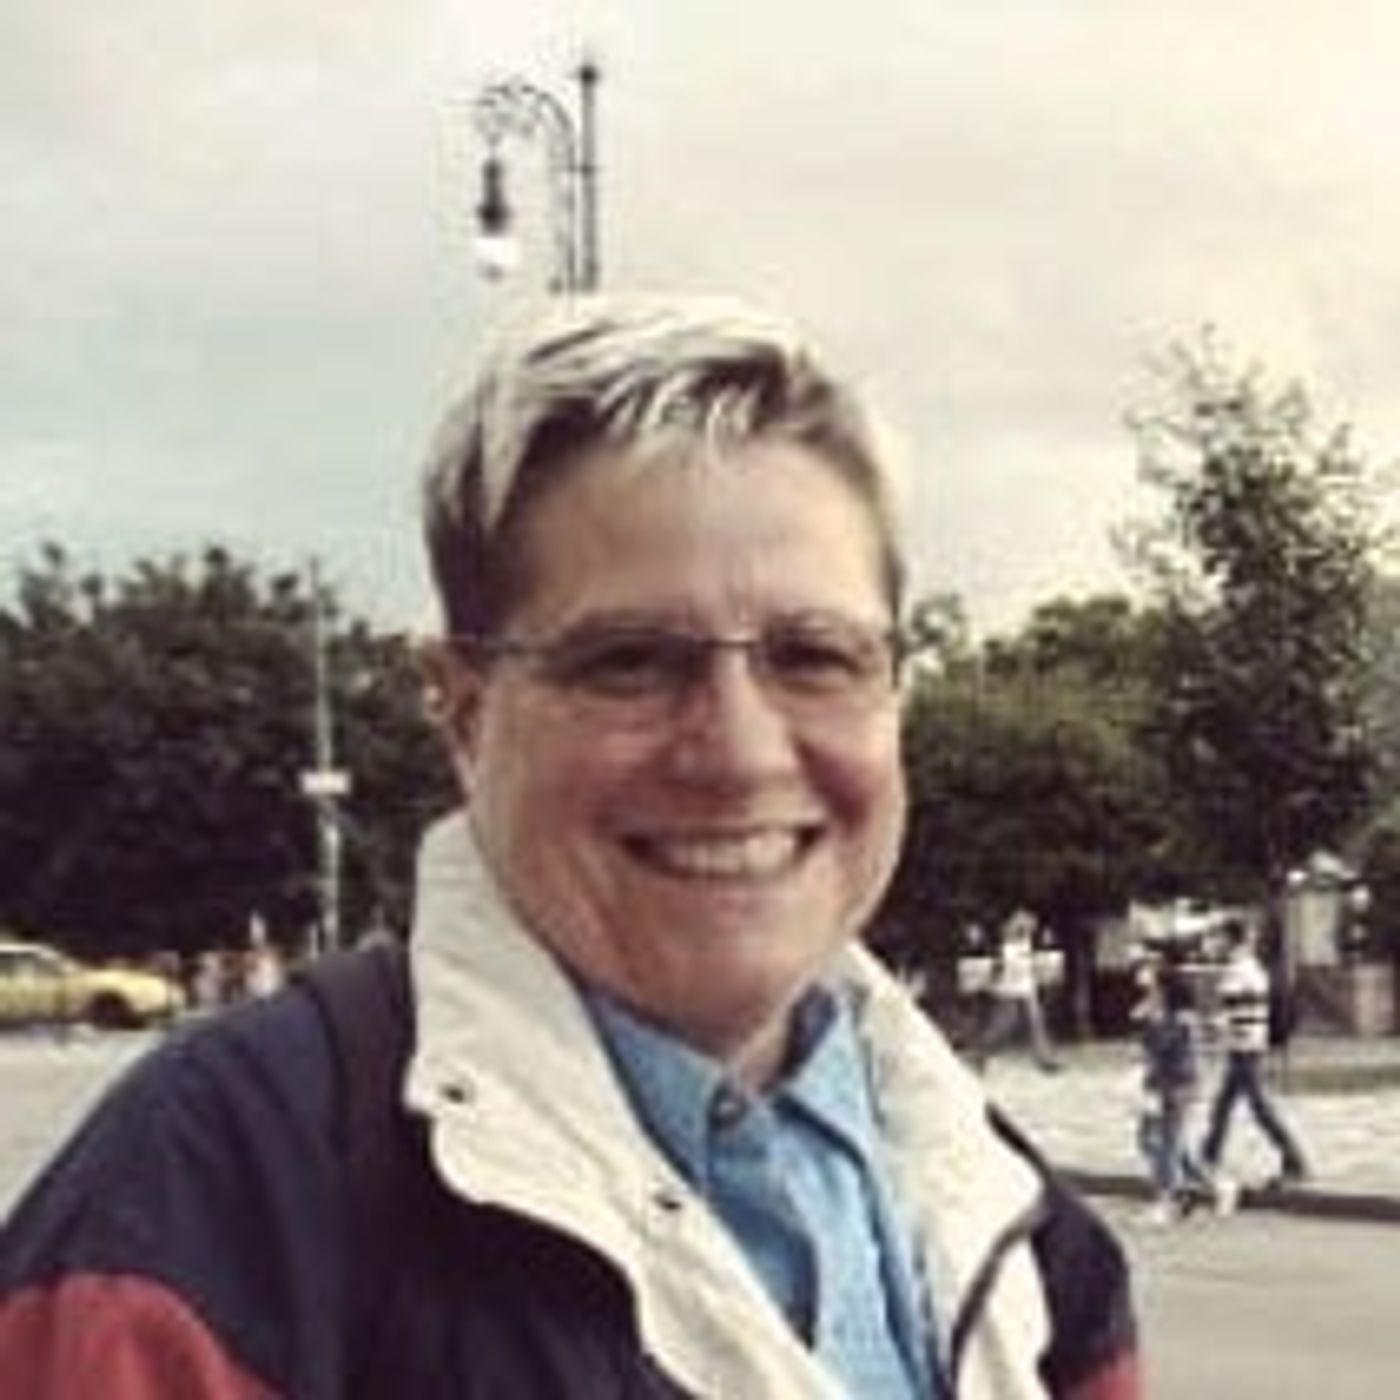 Observability beyond buzzwords with New Relic's Tori Wieldt